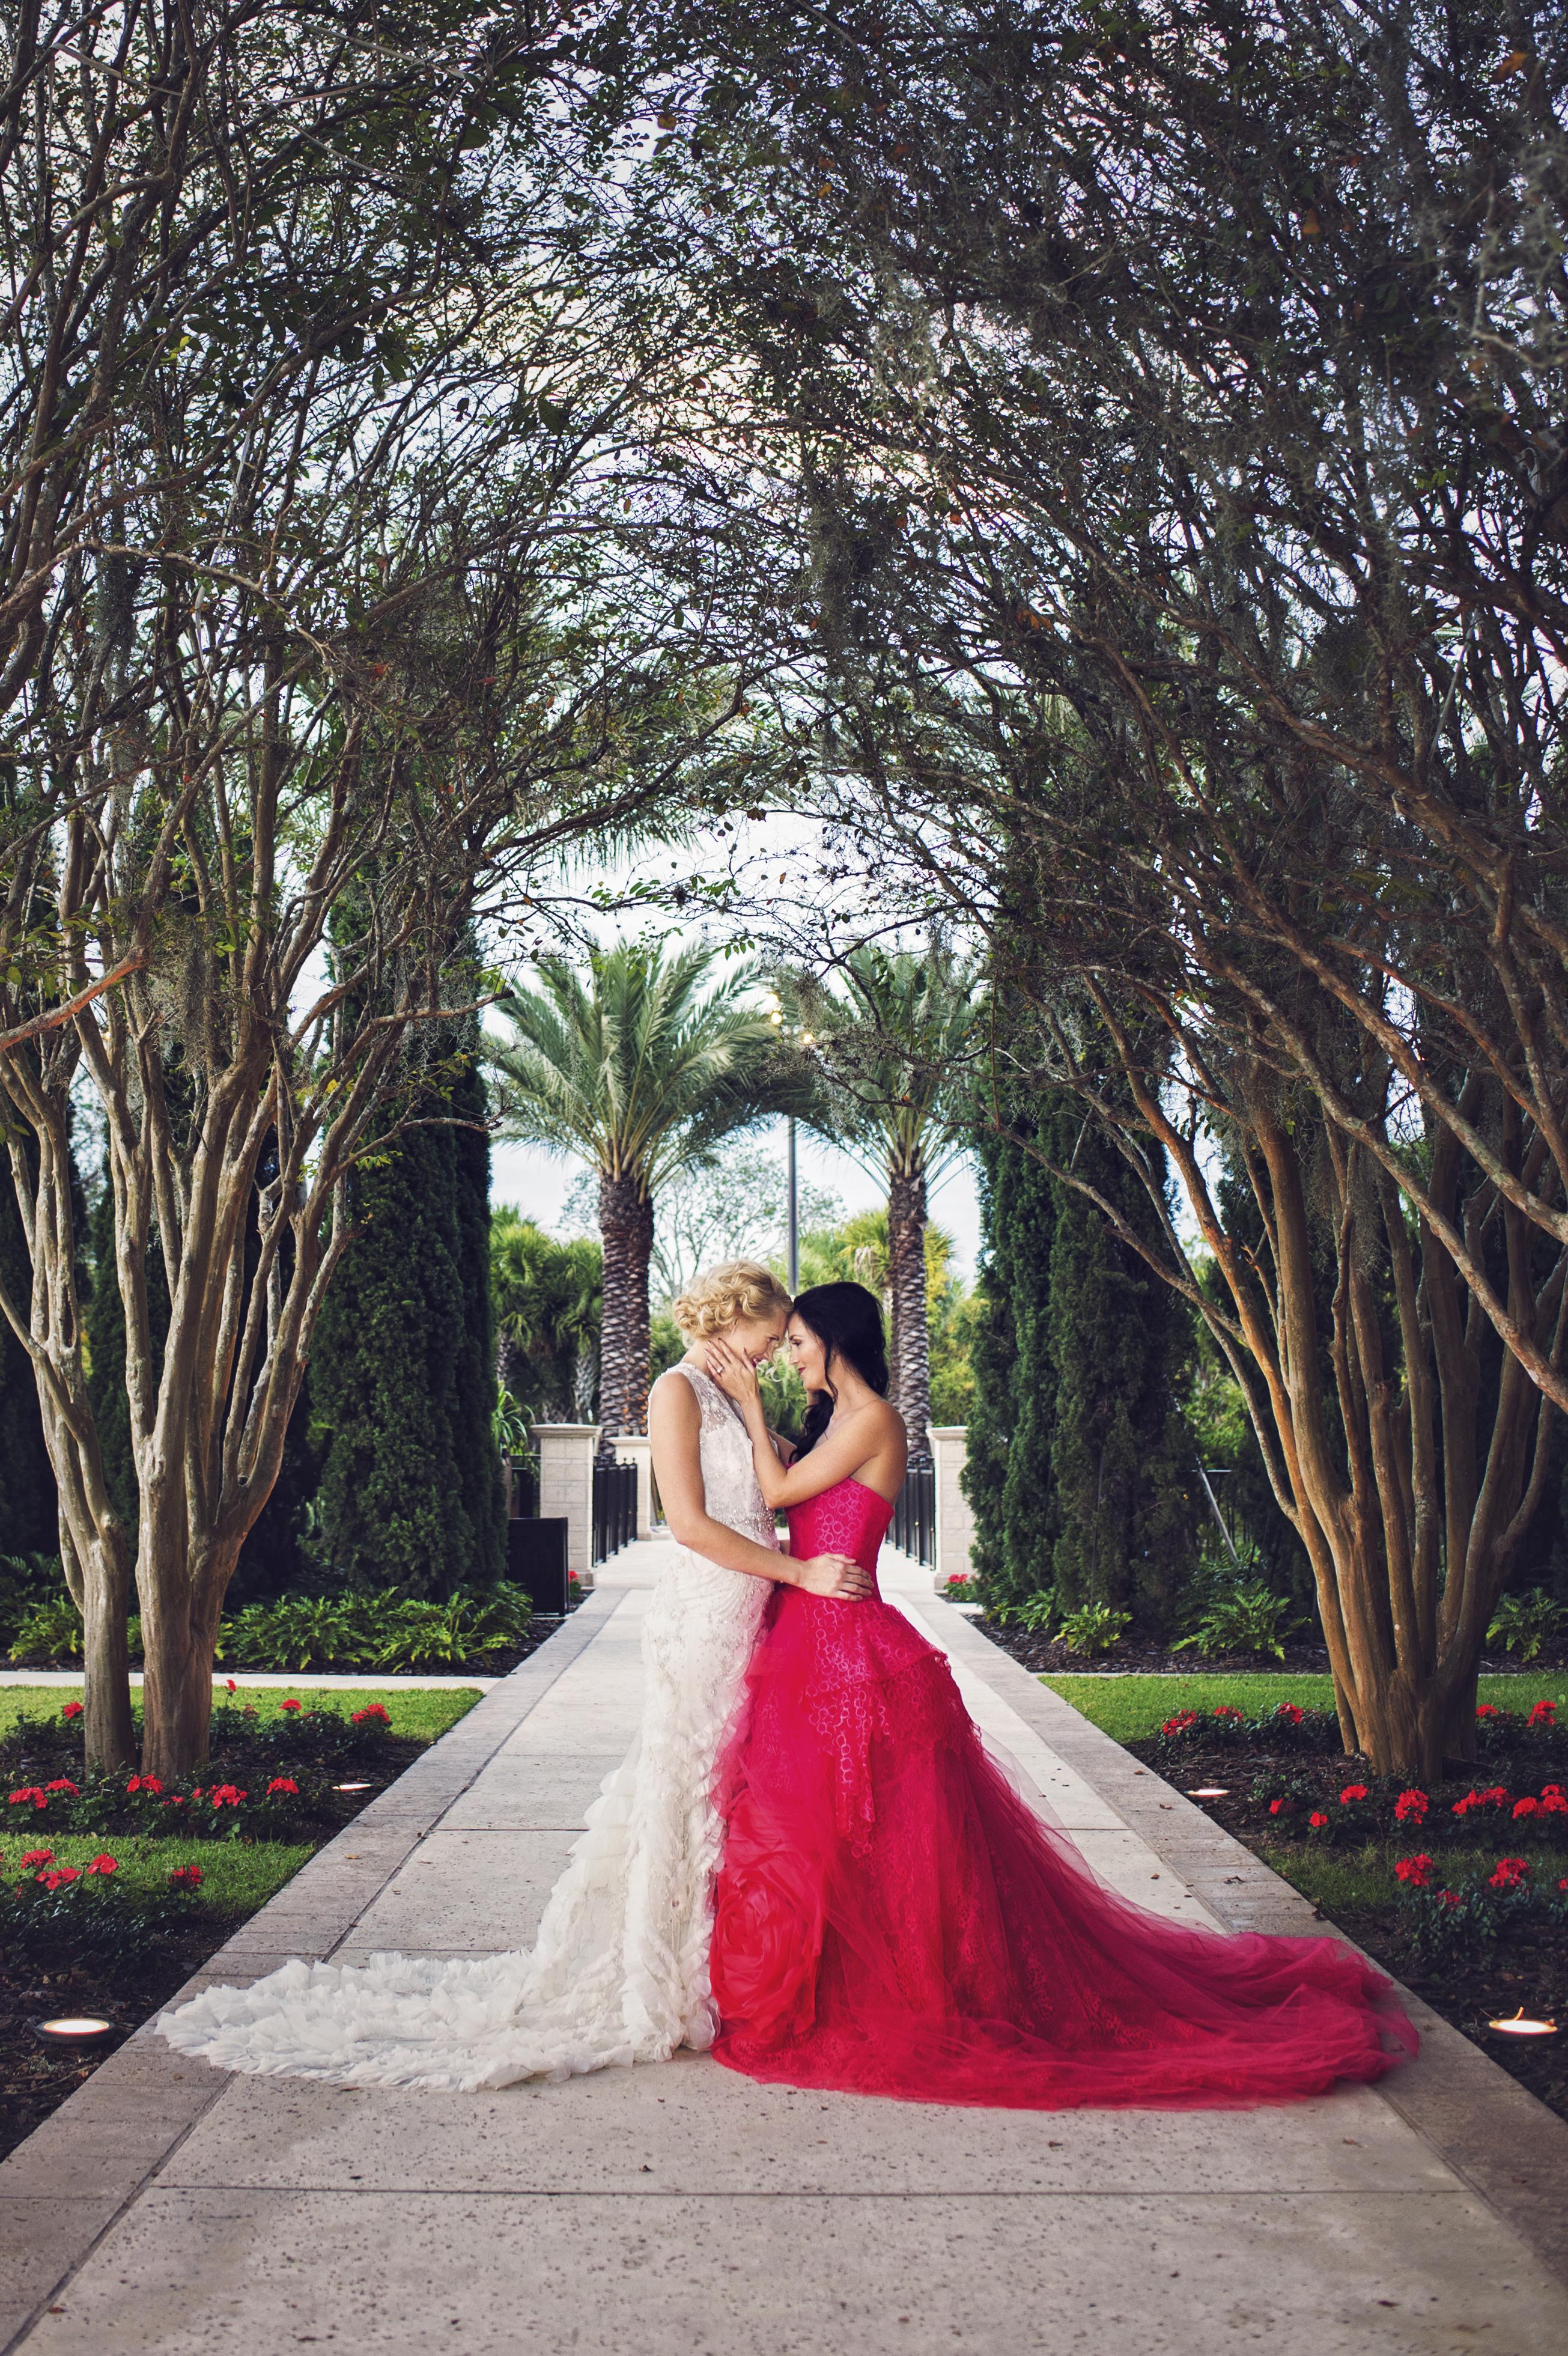 Holly Marie & Angee's Wedding - Jamie O' + Co